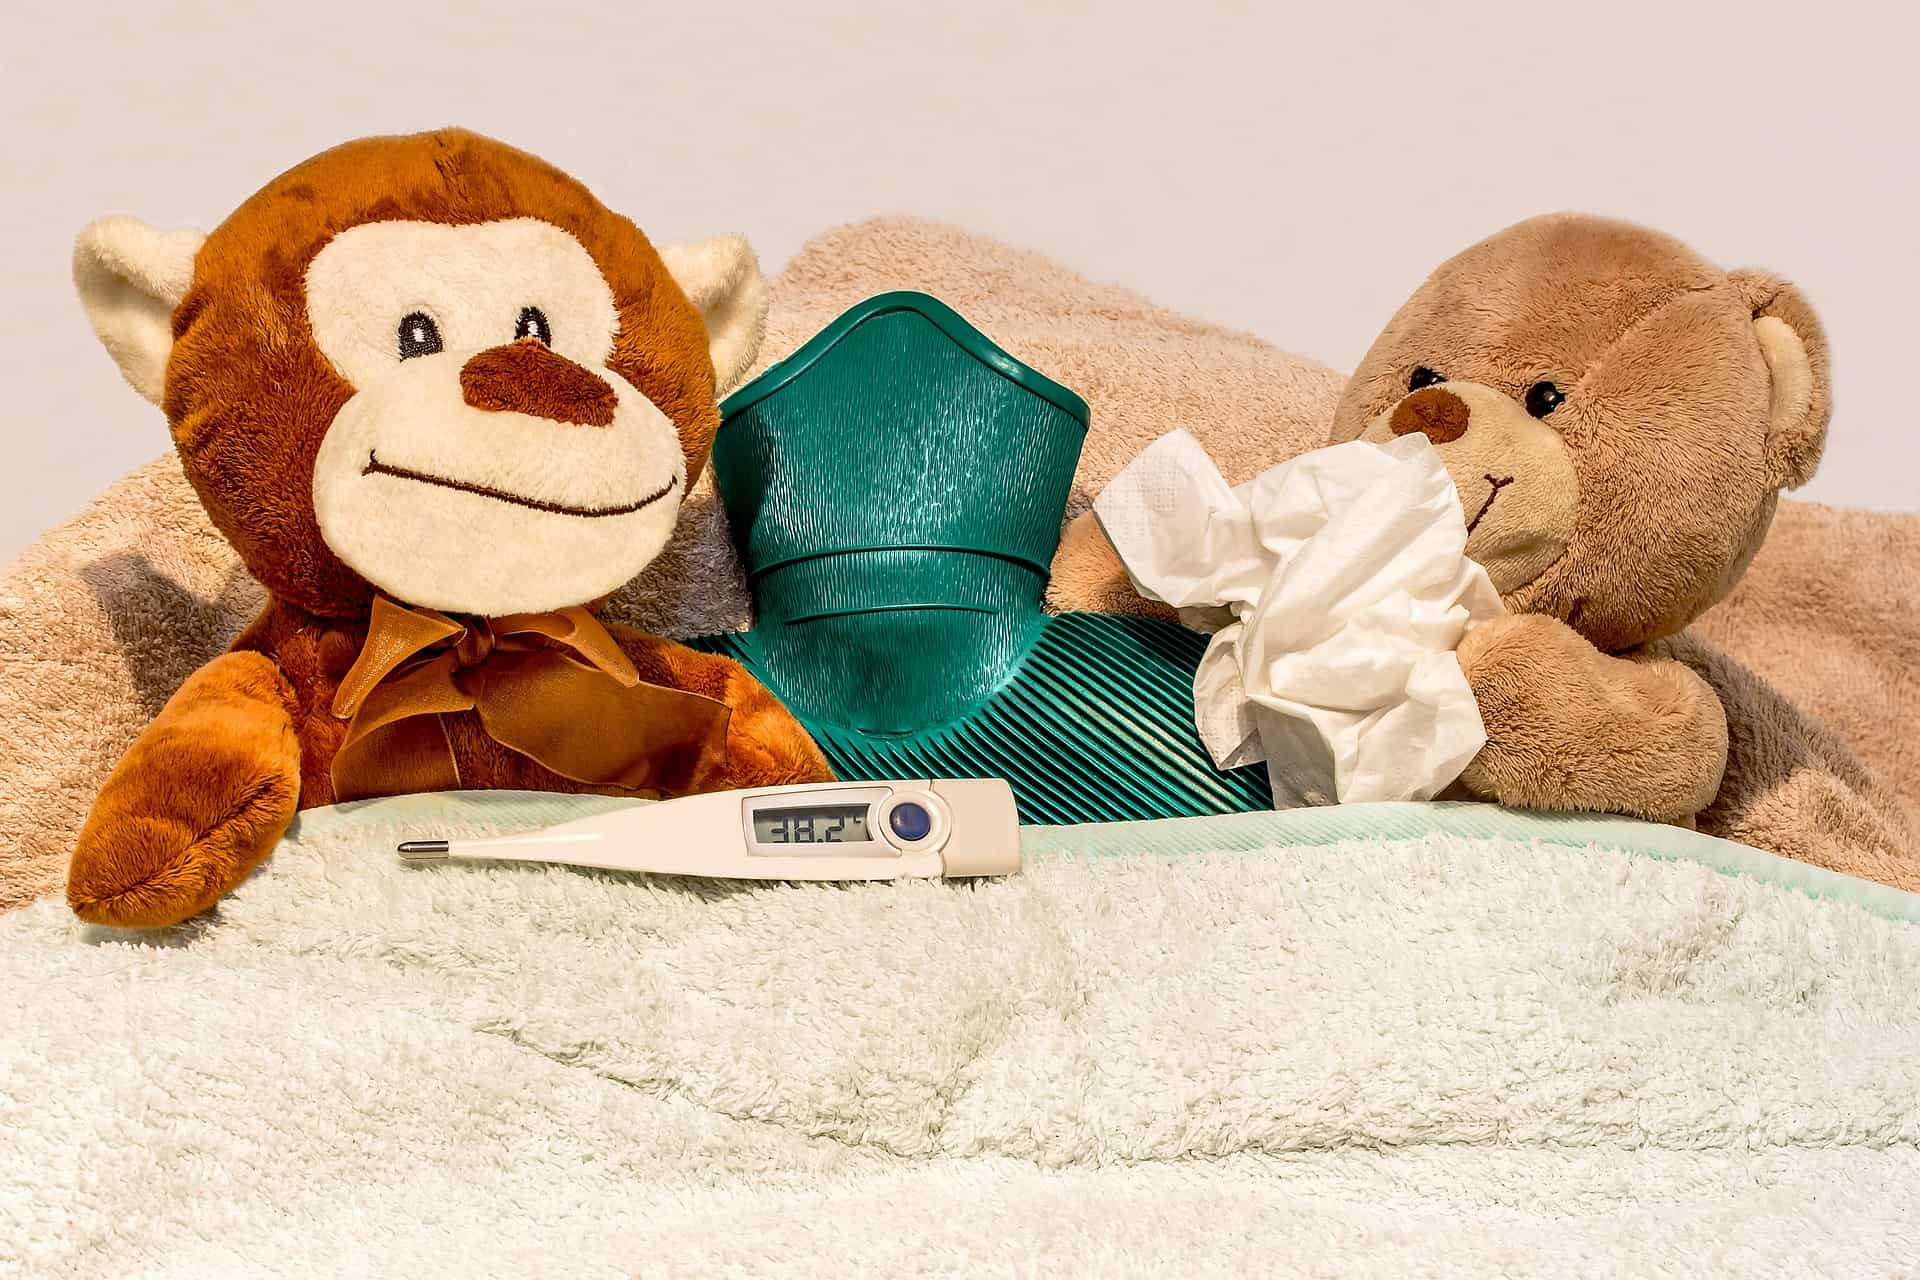 sick teddy and friend